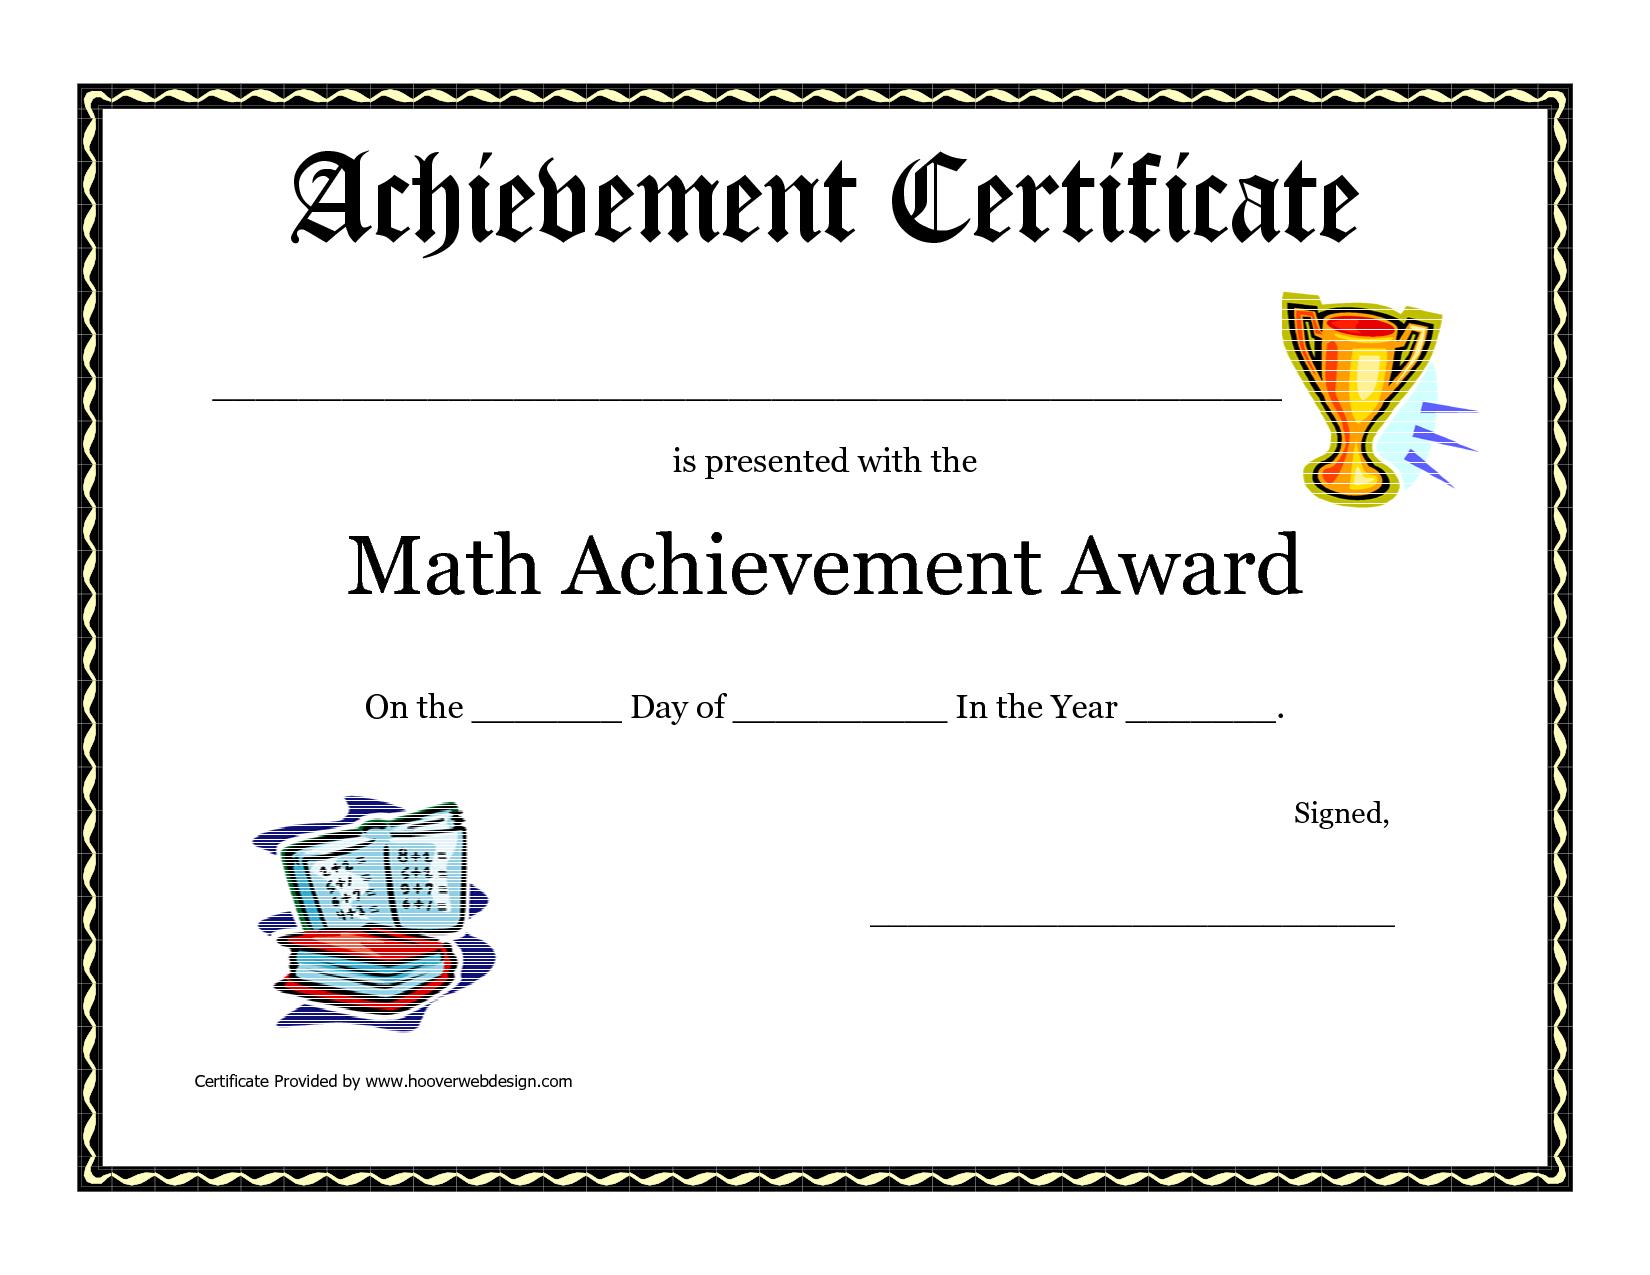 Math Achievement Award Printable Certificate Pdf in Science Fair Certificate Templates